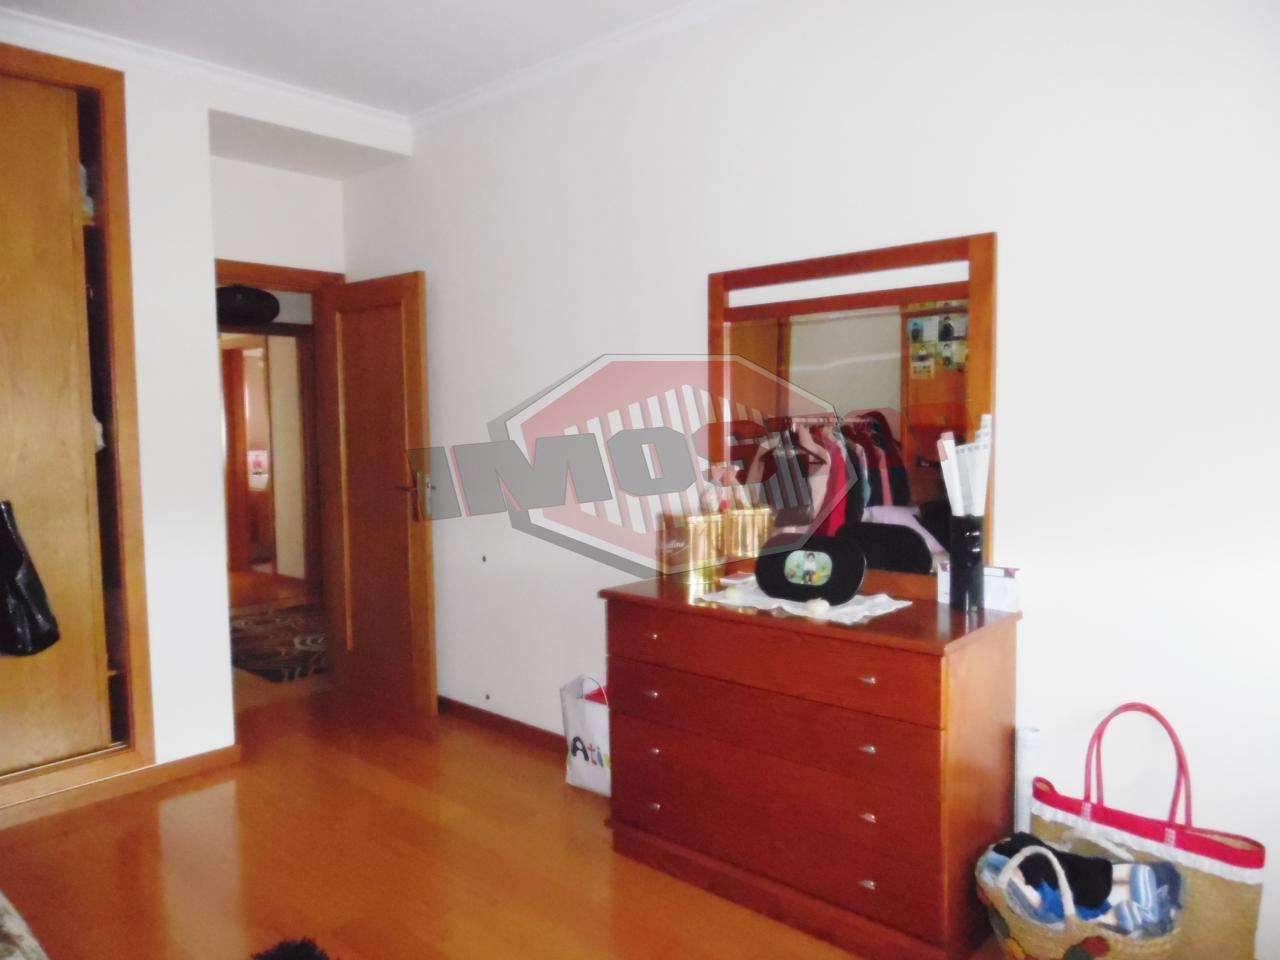 Apartamento para comprar, Oiã, Oliveira do Bairro, Aveiro - Foto 11